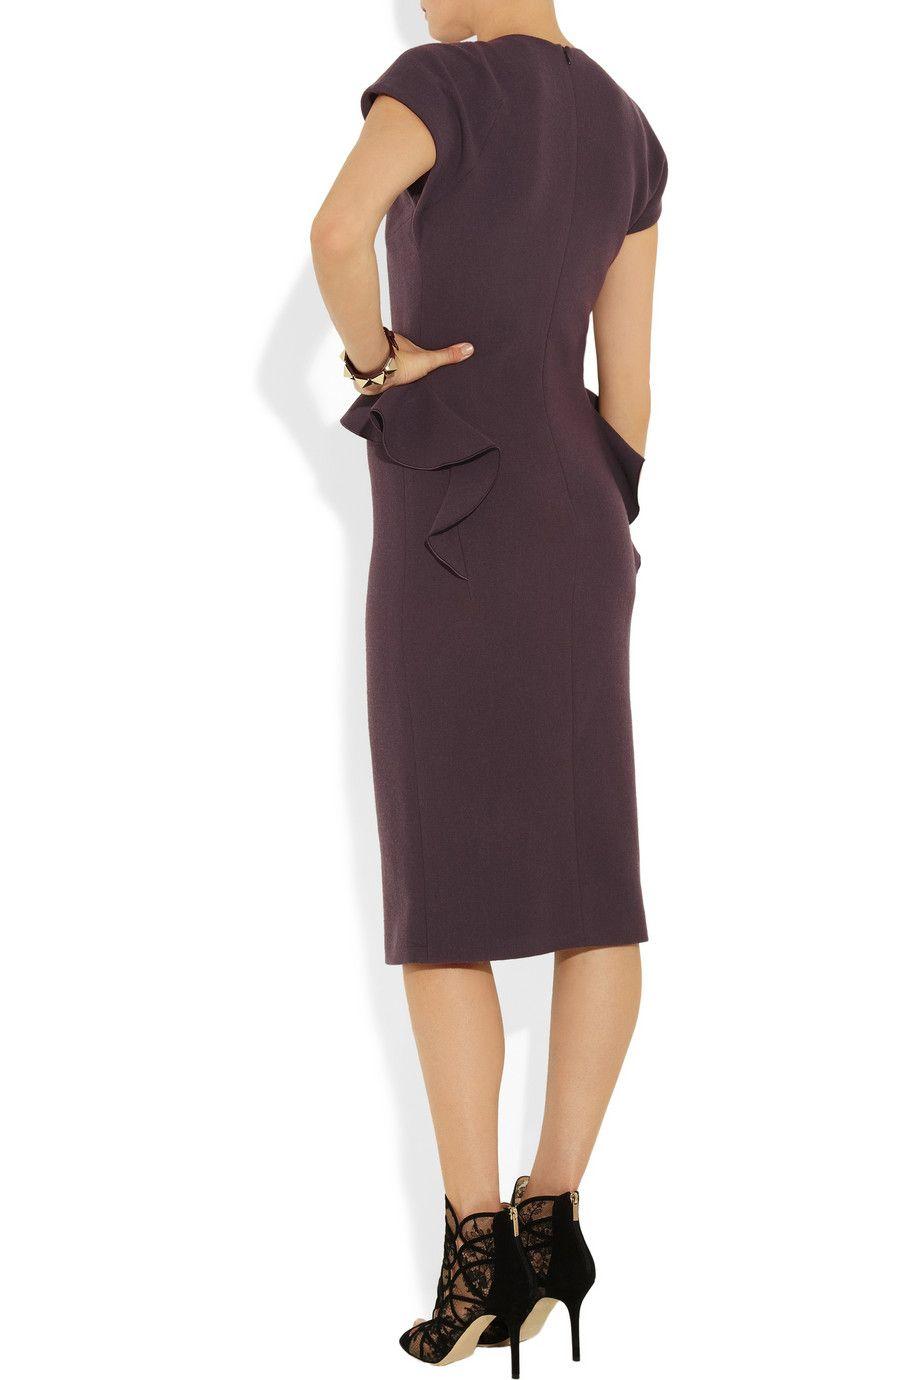 Bottega Veneta Ruffle-trimmed wool-crepe dress NET-A-PORTER.COM